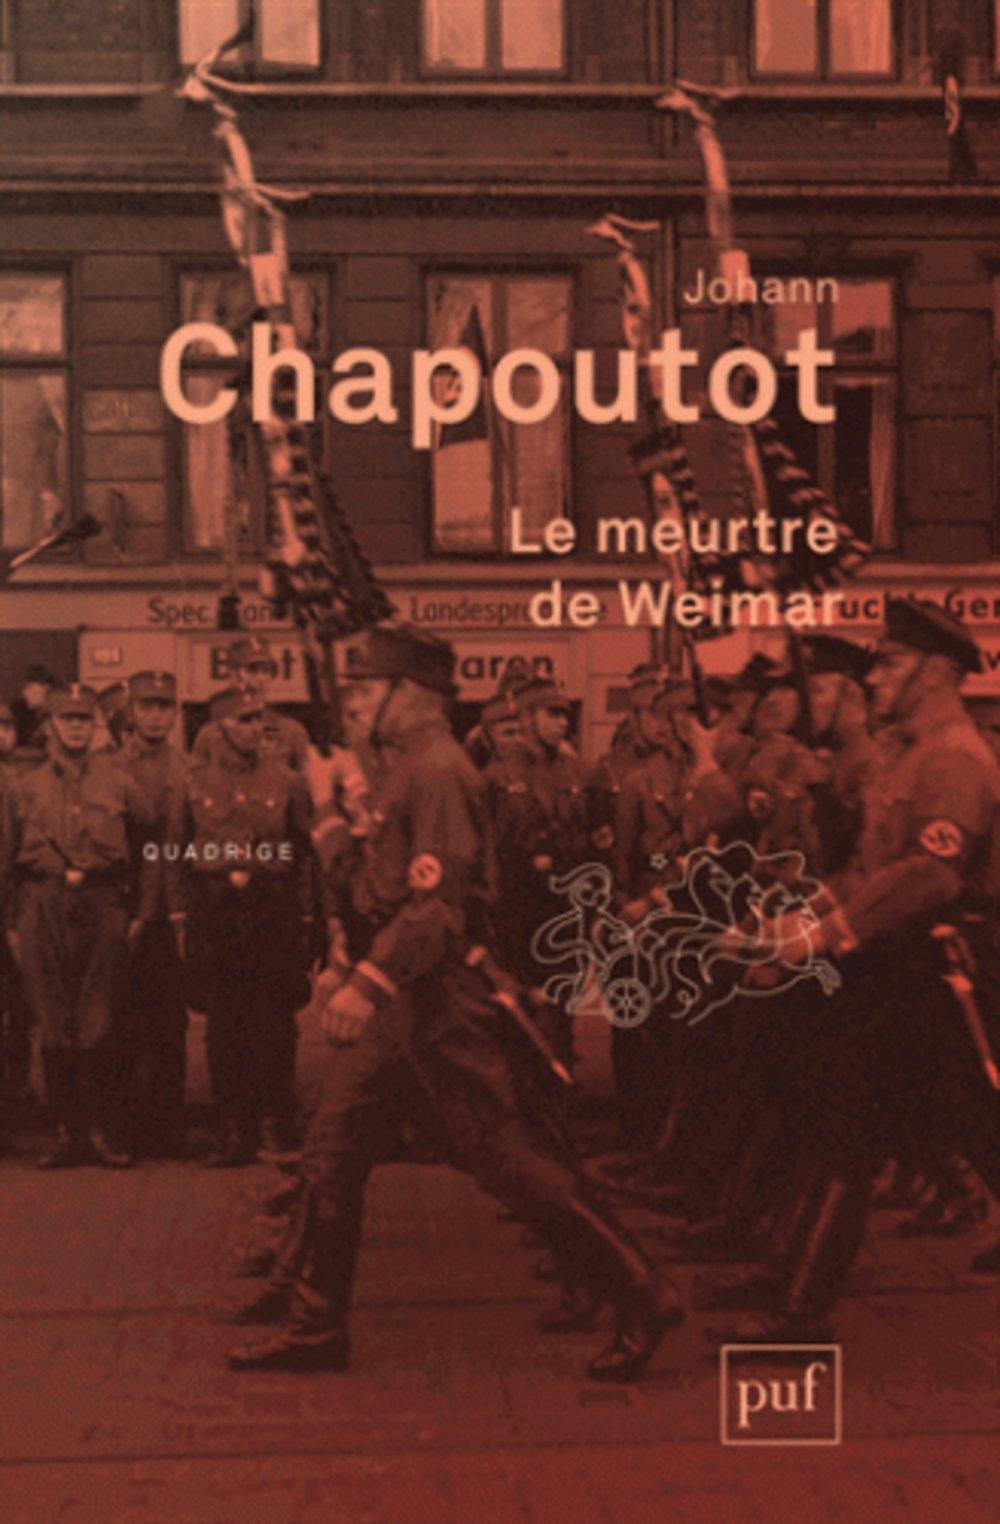 Chapoutot